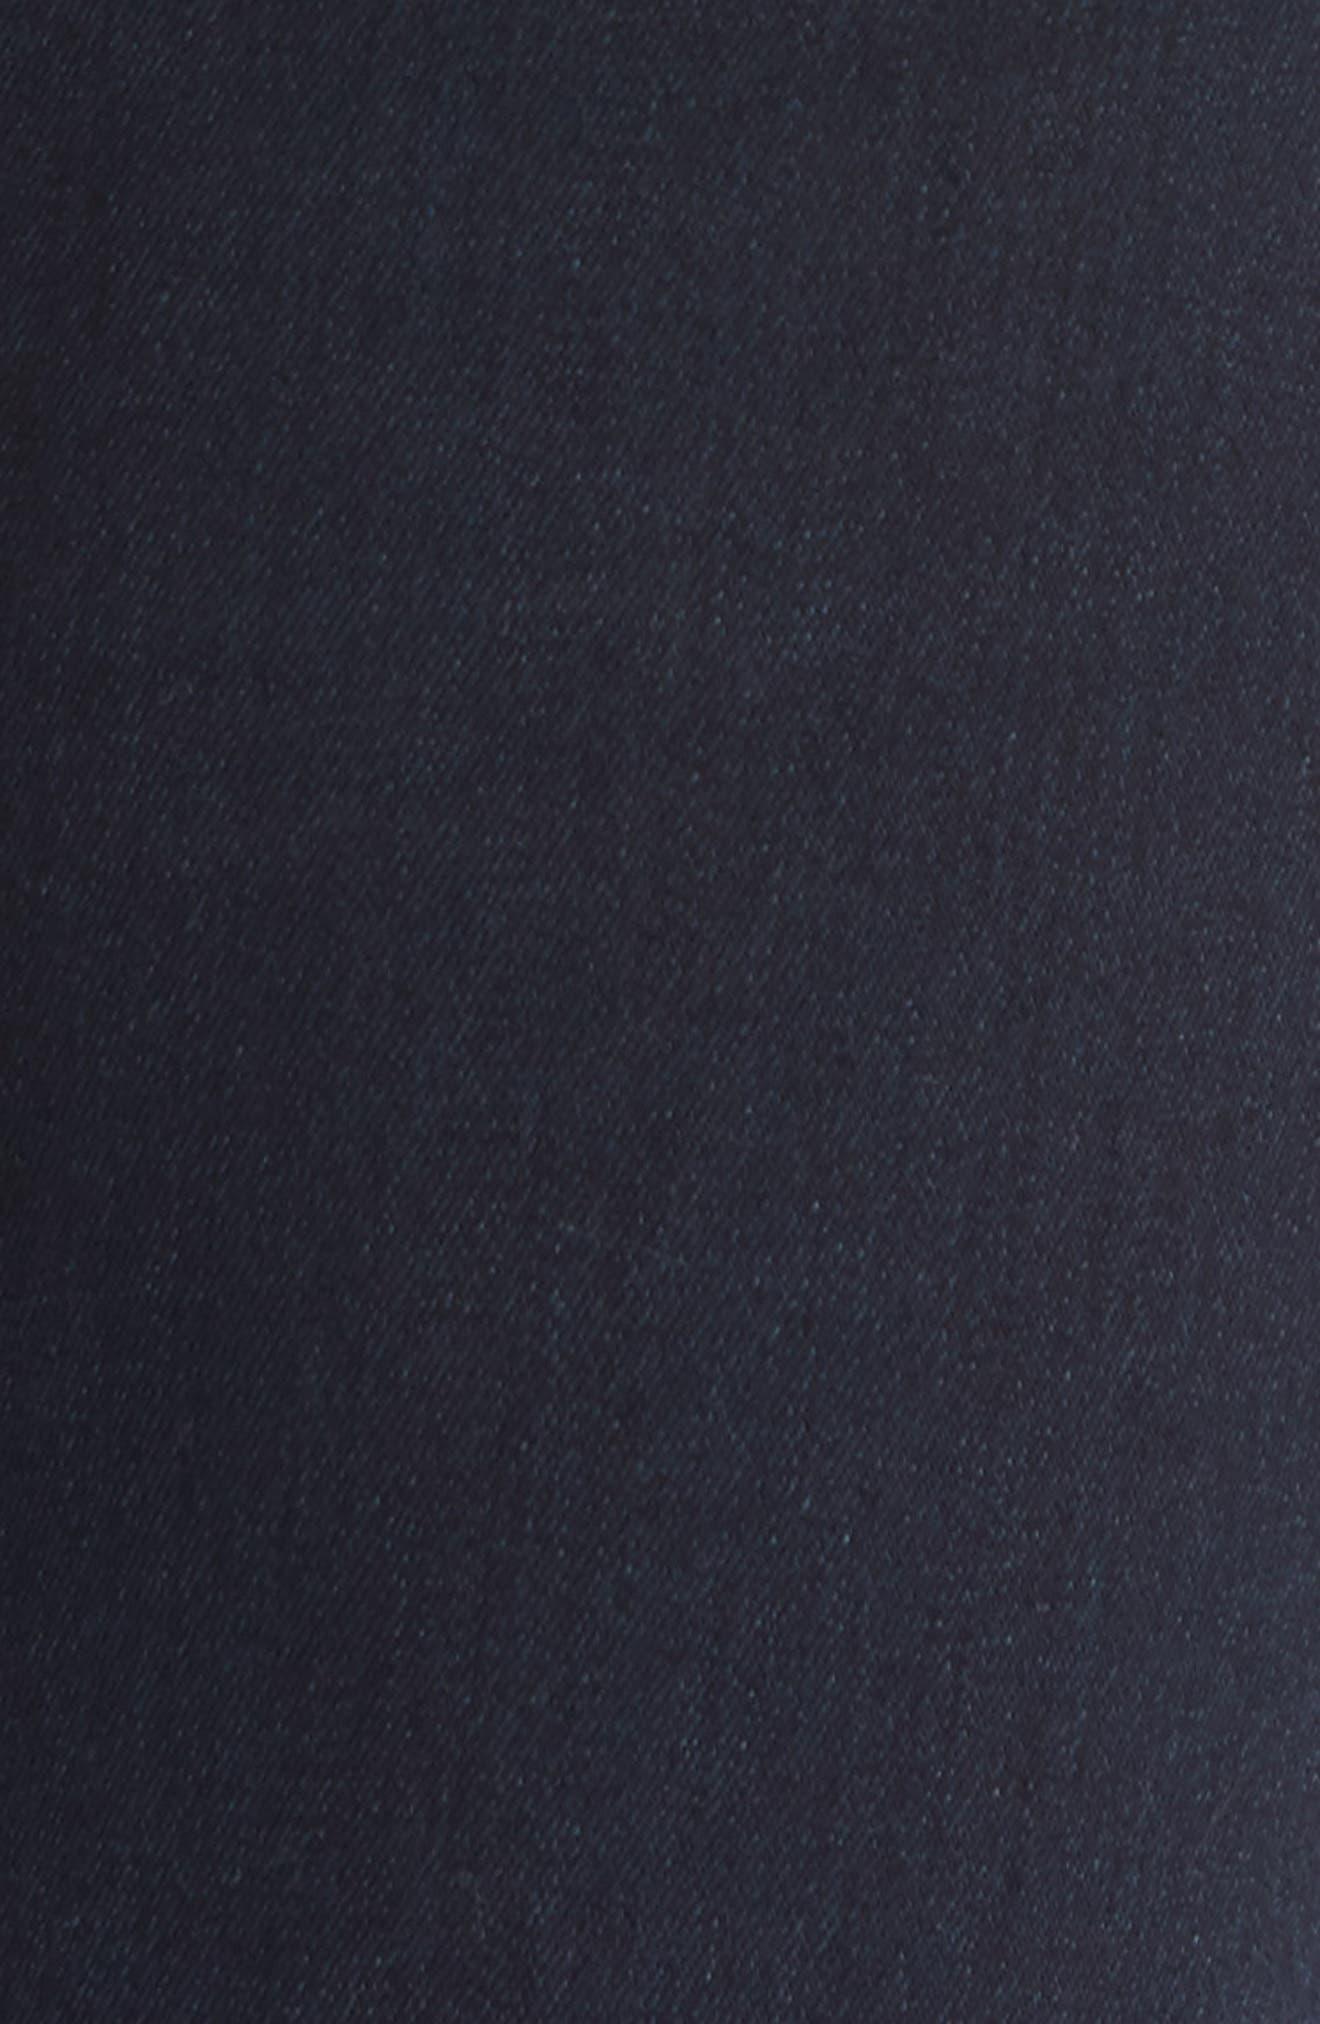 Rocket High Waist Skinny Jeans,                             Alternate thumbnail 5, color,                             Ozone Ink